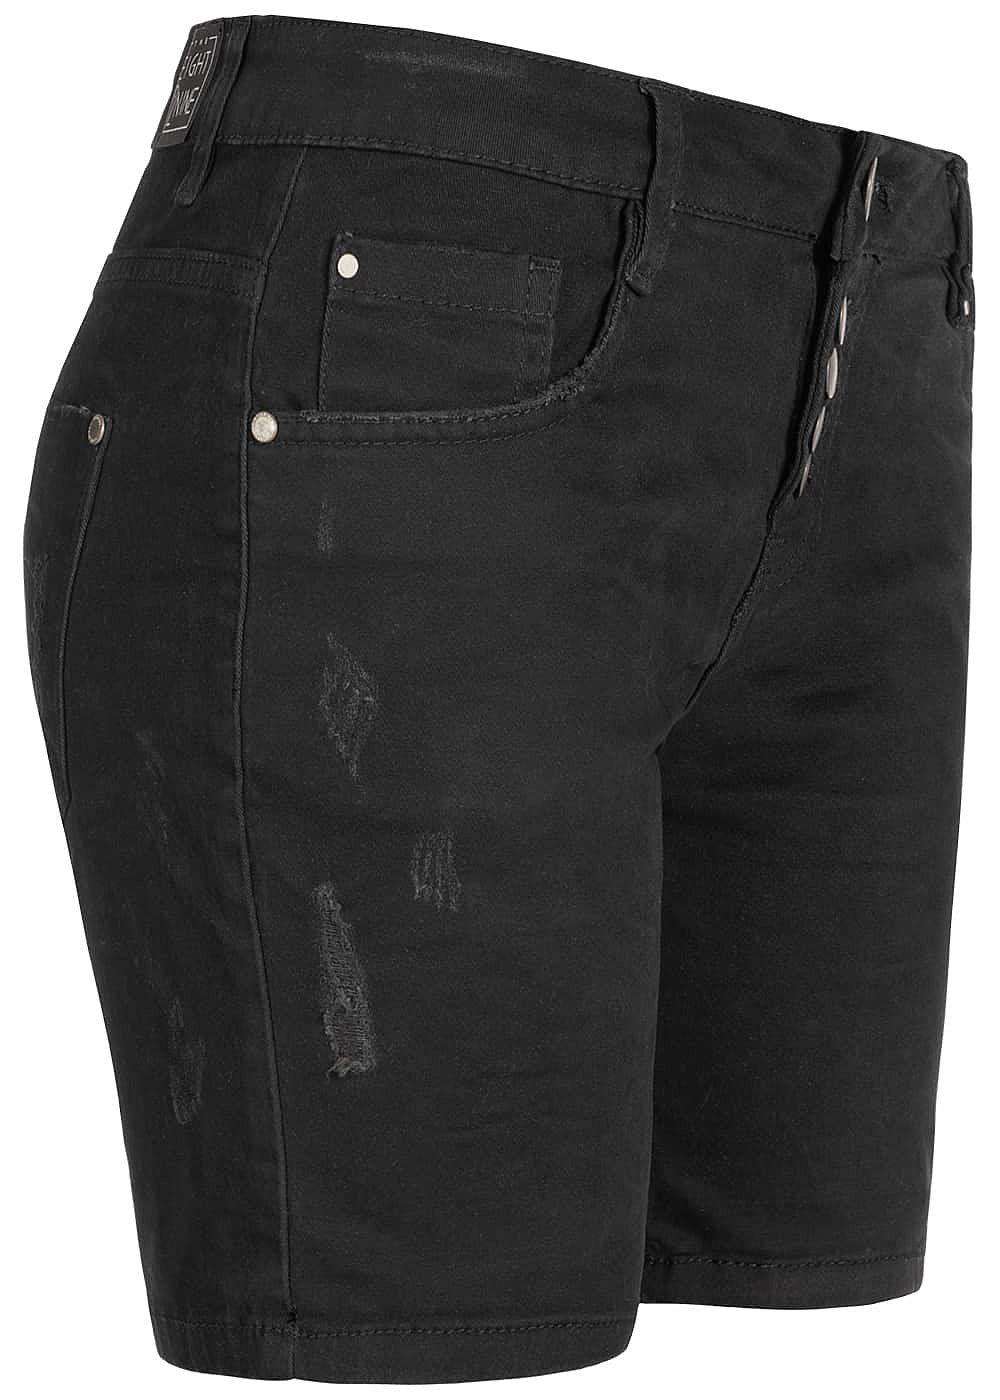 bc3de2af33e219 Eight2Nine Damen Bermuda Shorts 5-Pockets Destroy Look schwarz denim ...